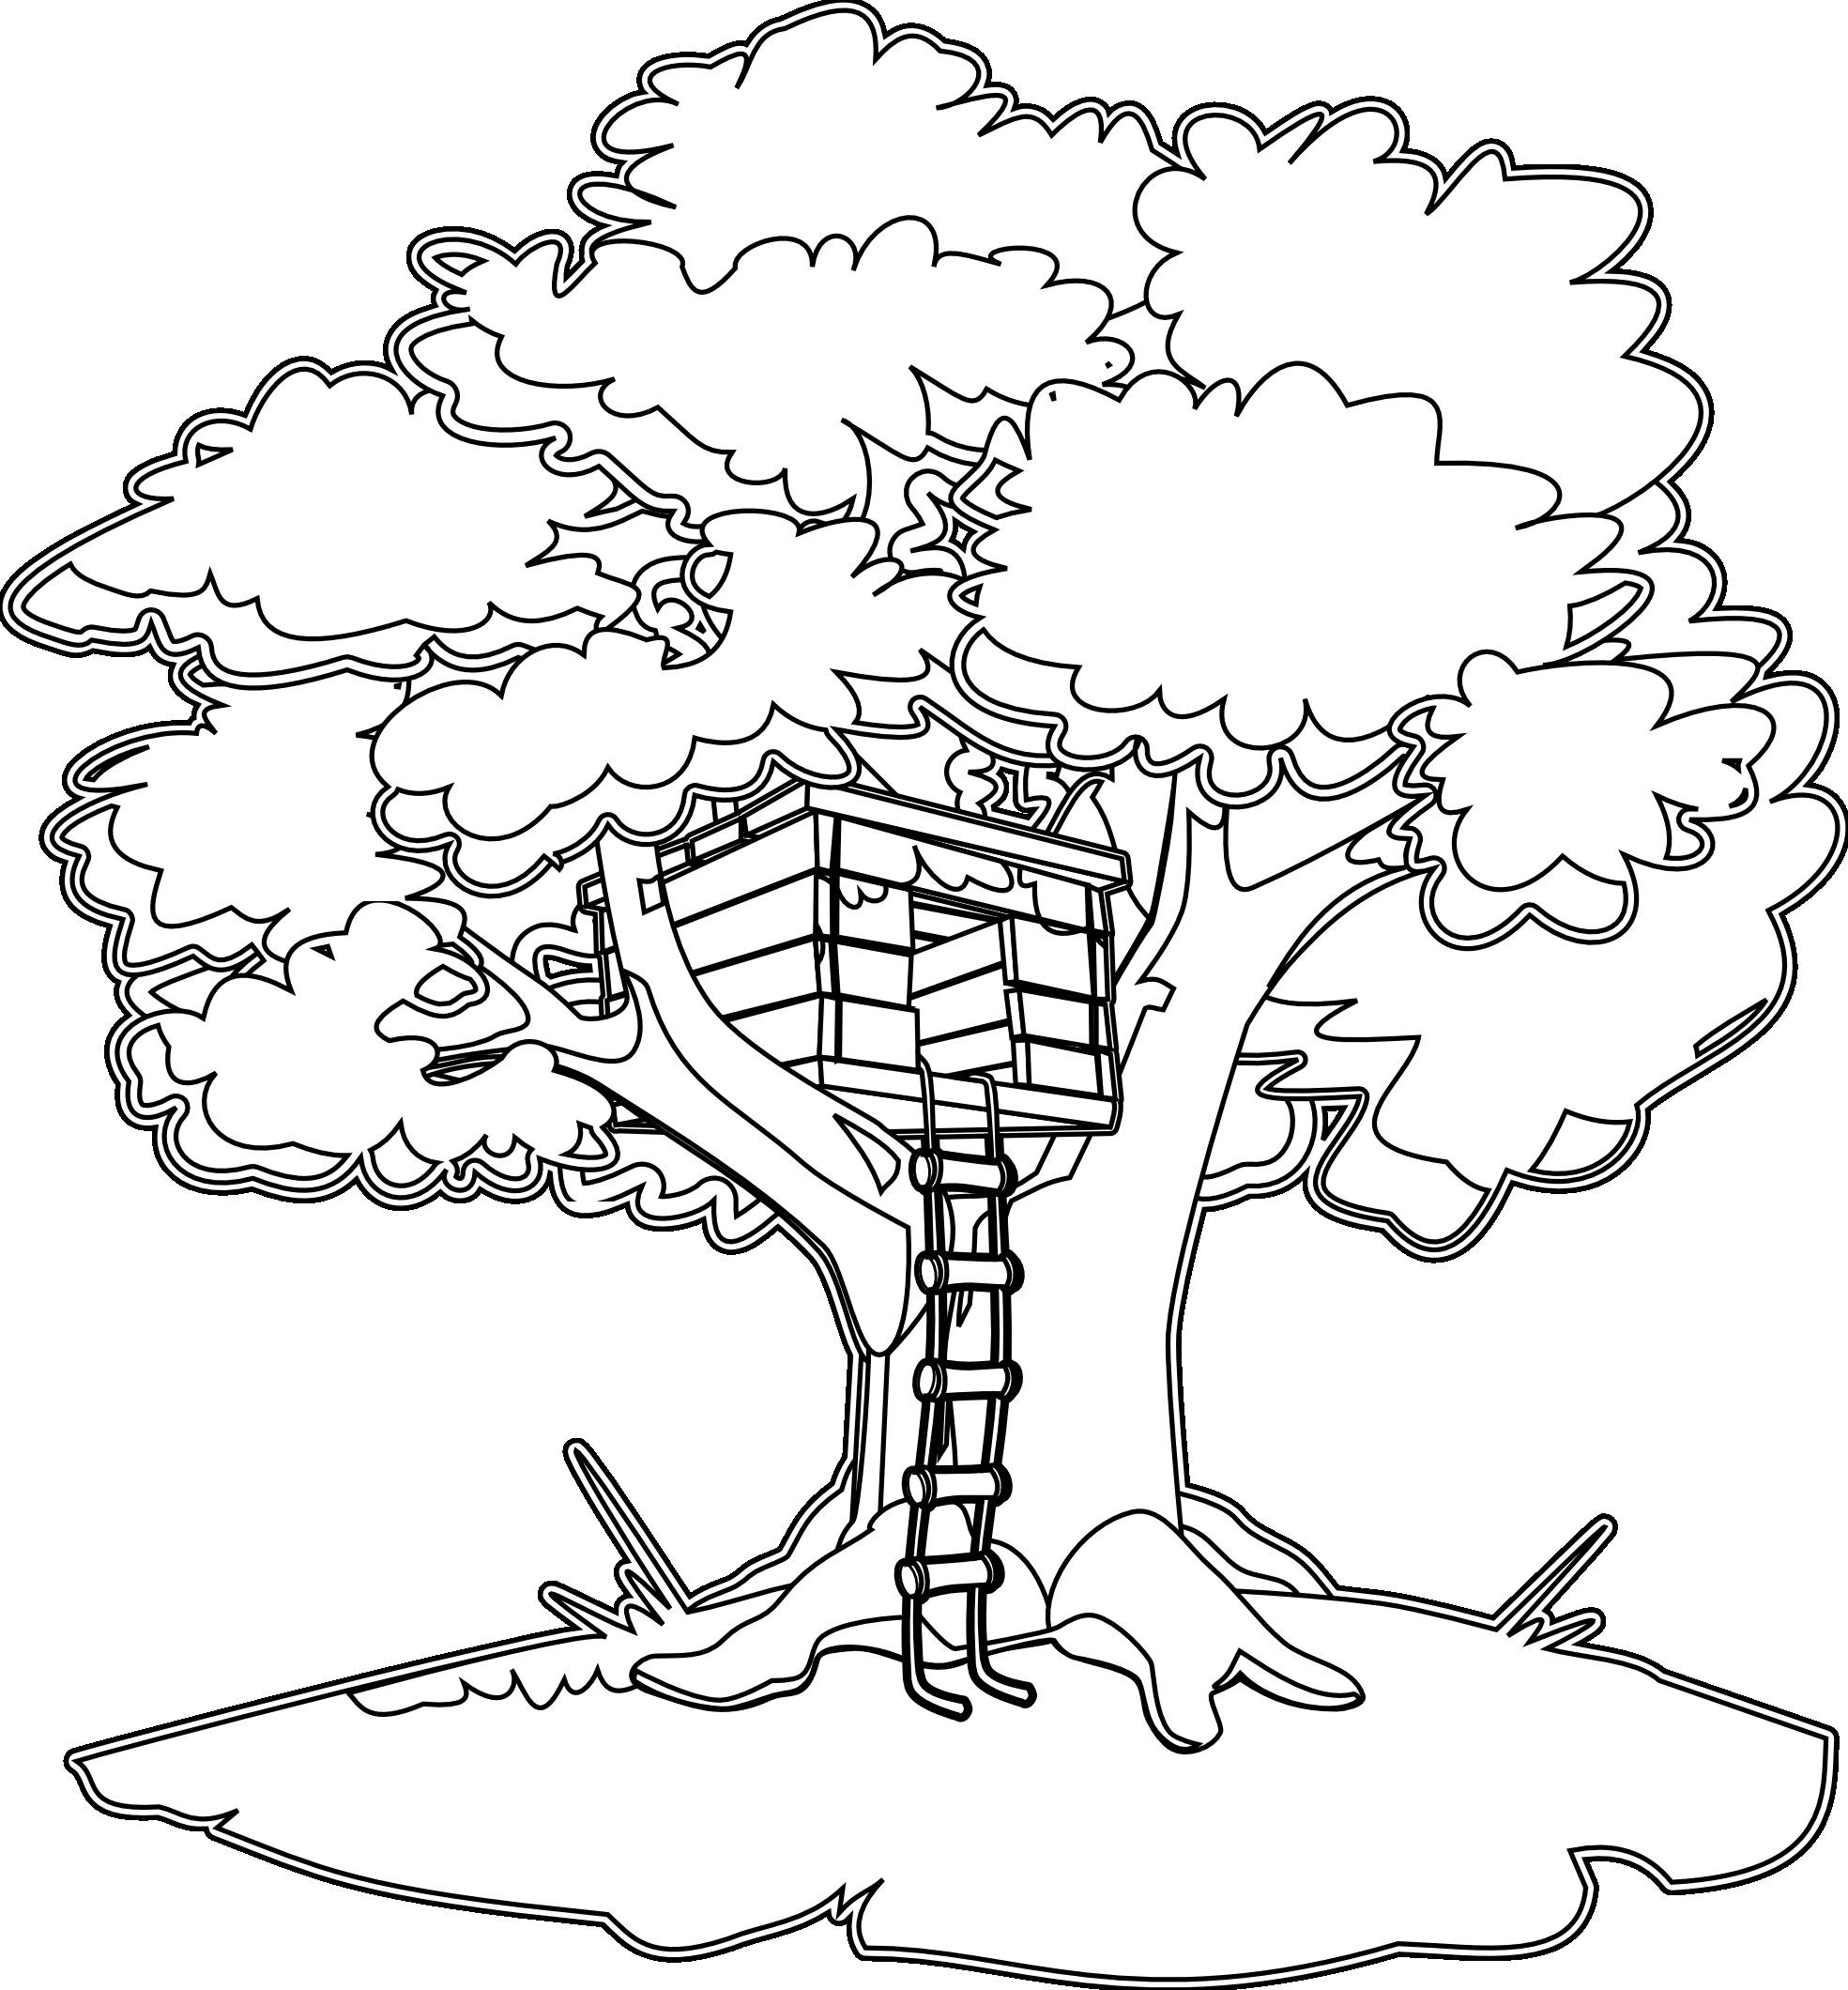 Magical Tree Drawing At Getdrawings